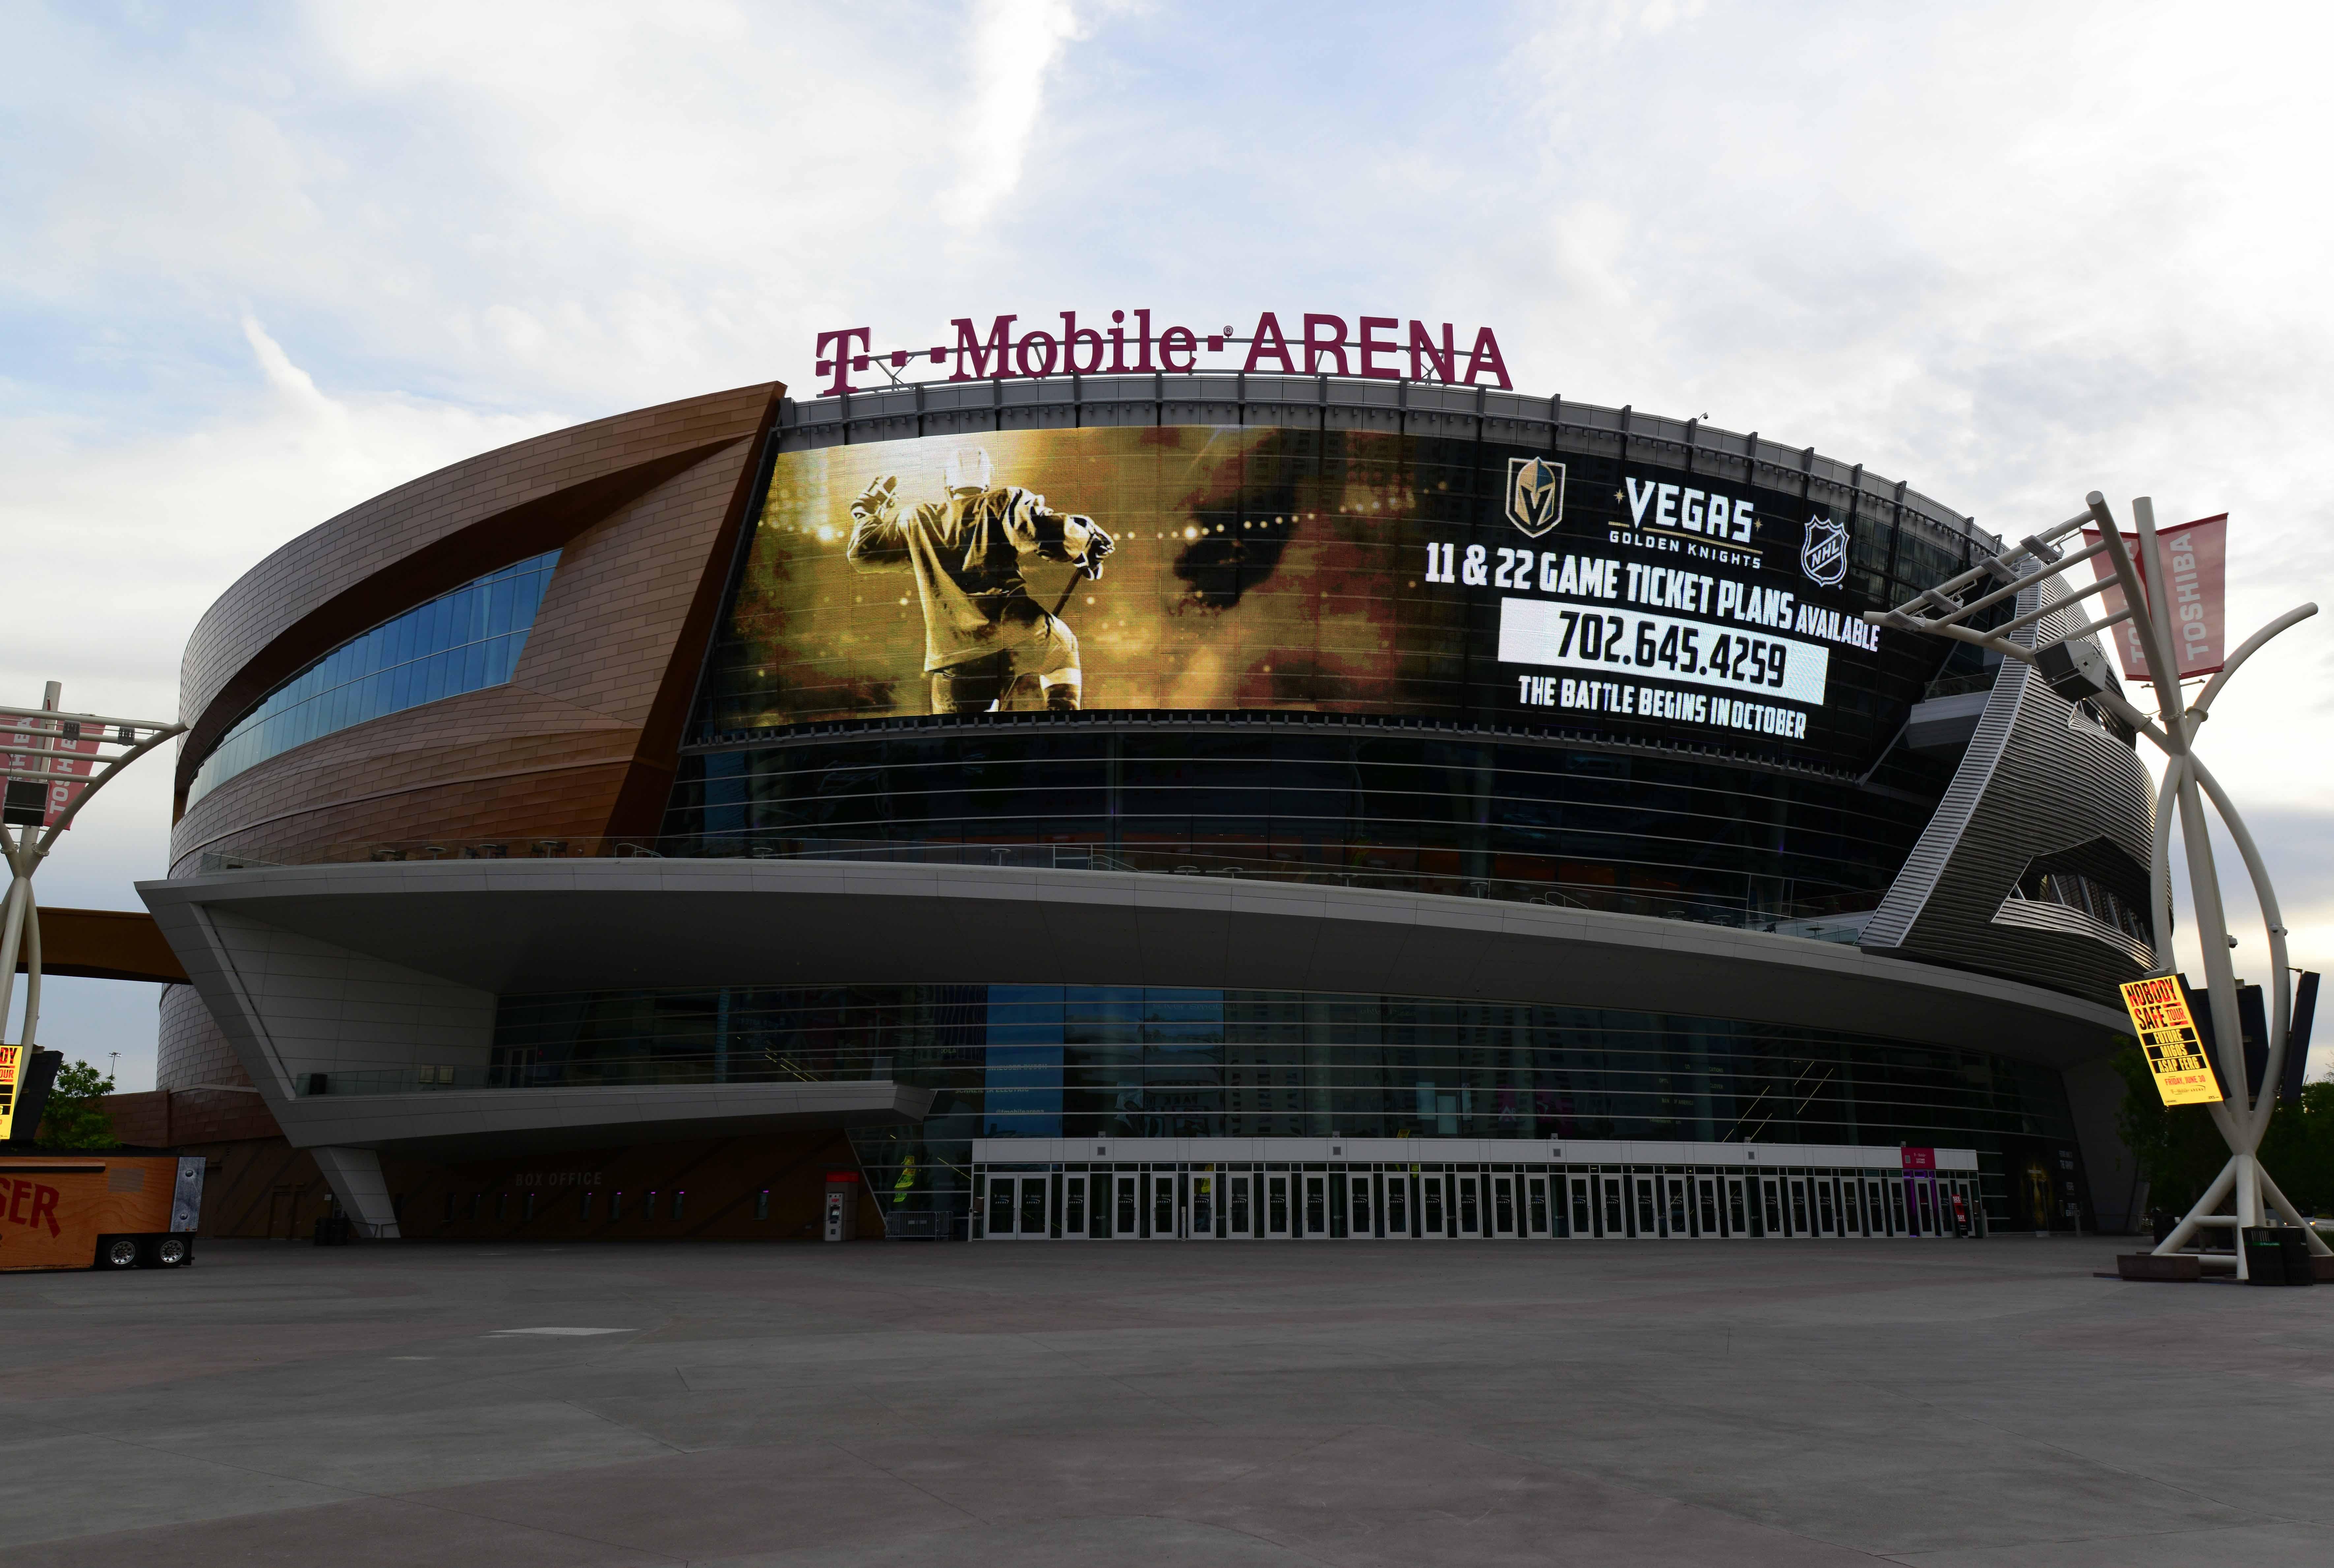 NHL: T-Mobile Arena Views